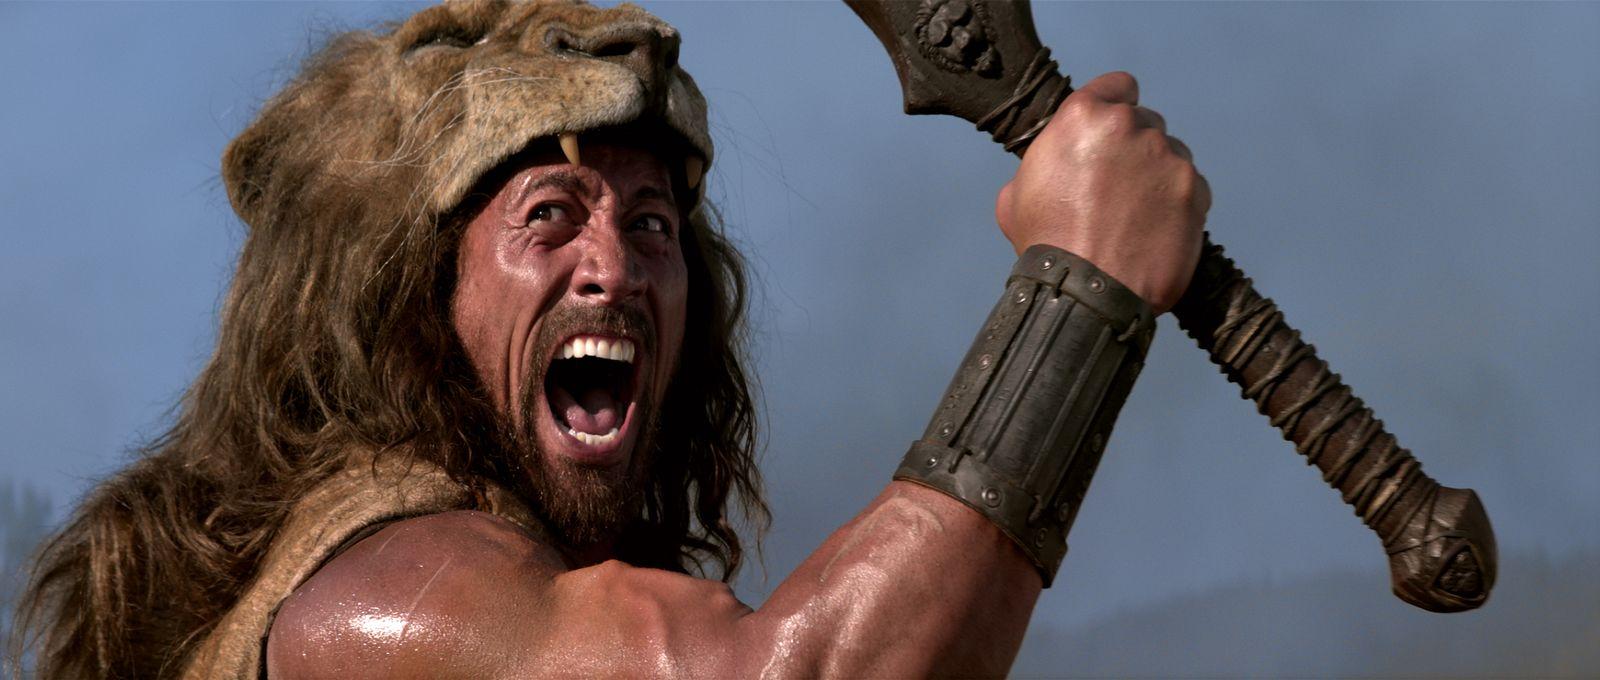 Film Hercules (2014)